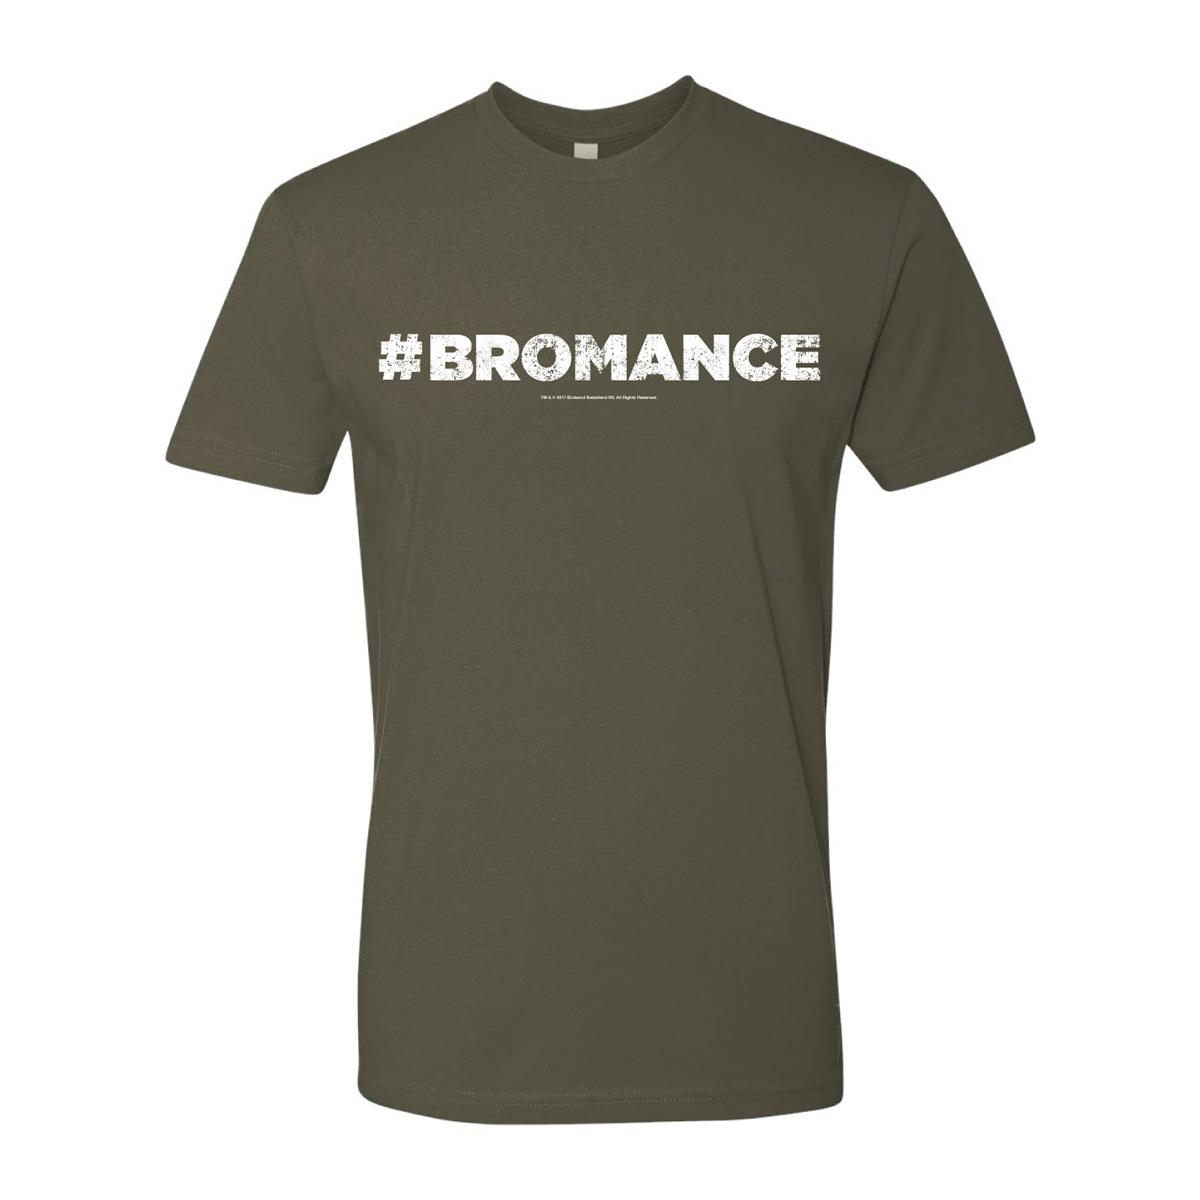 Big Brother Bromance T-Shirt